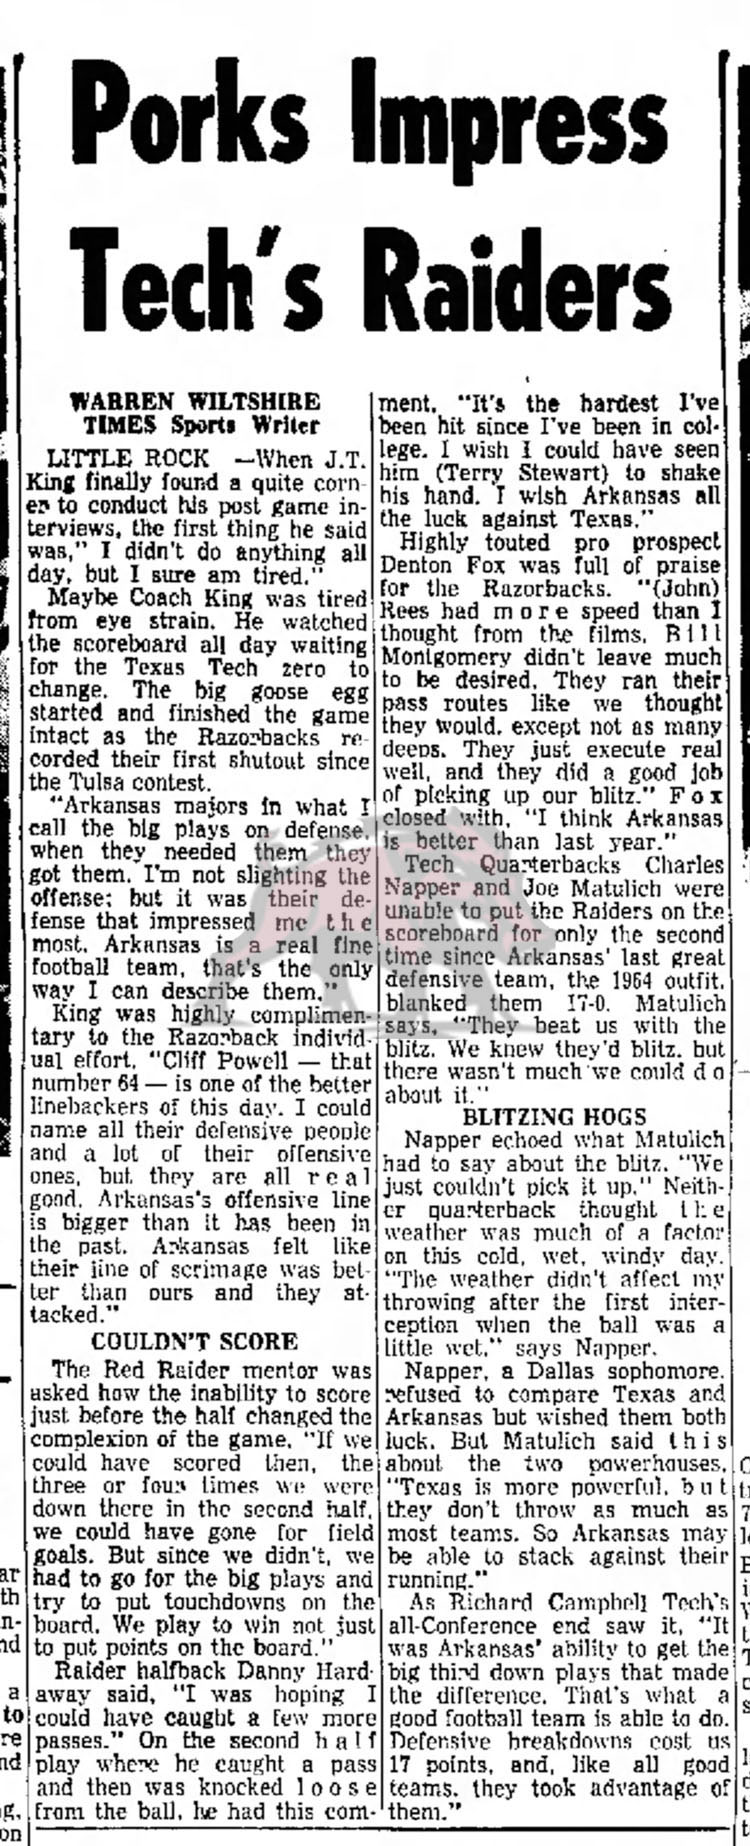 1969-11-28 Northwest_Arkansas_Times_Fri__Nov_28__1969_